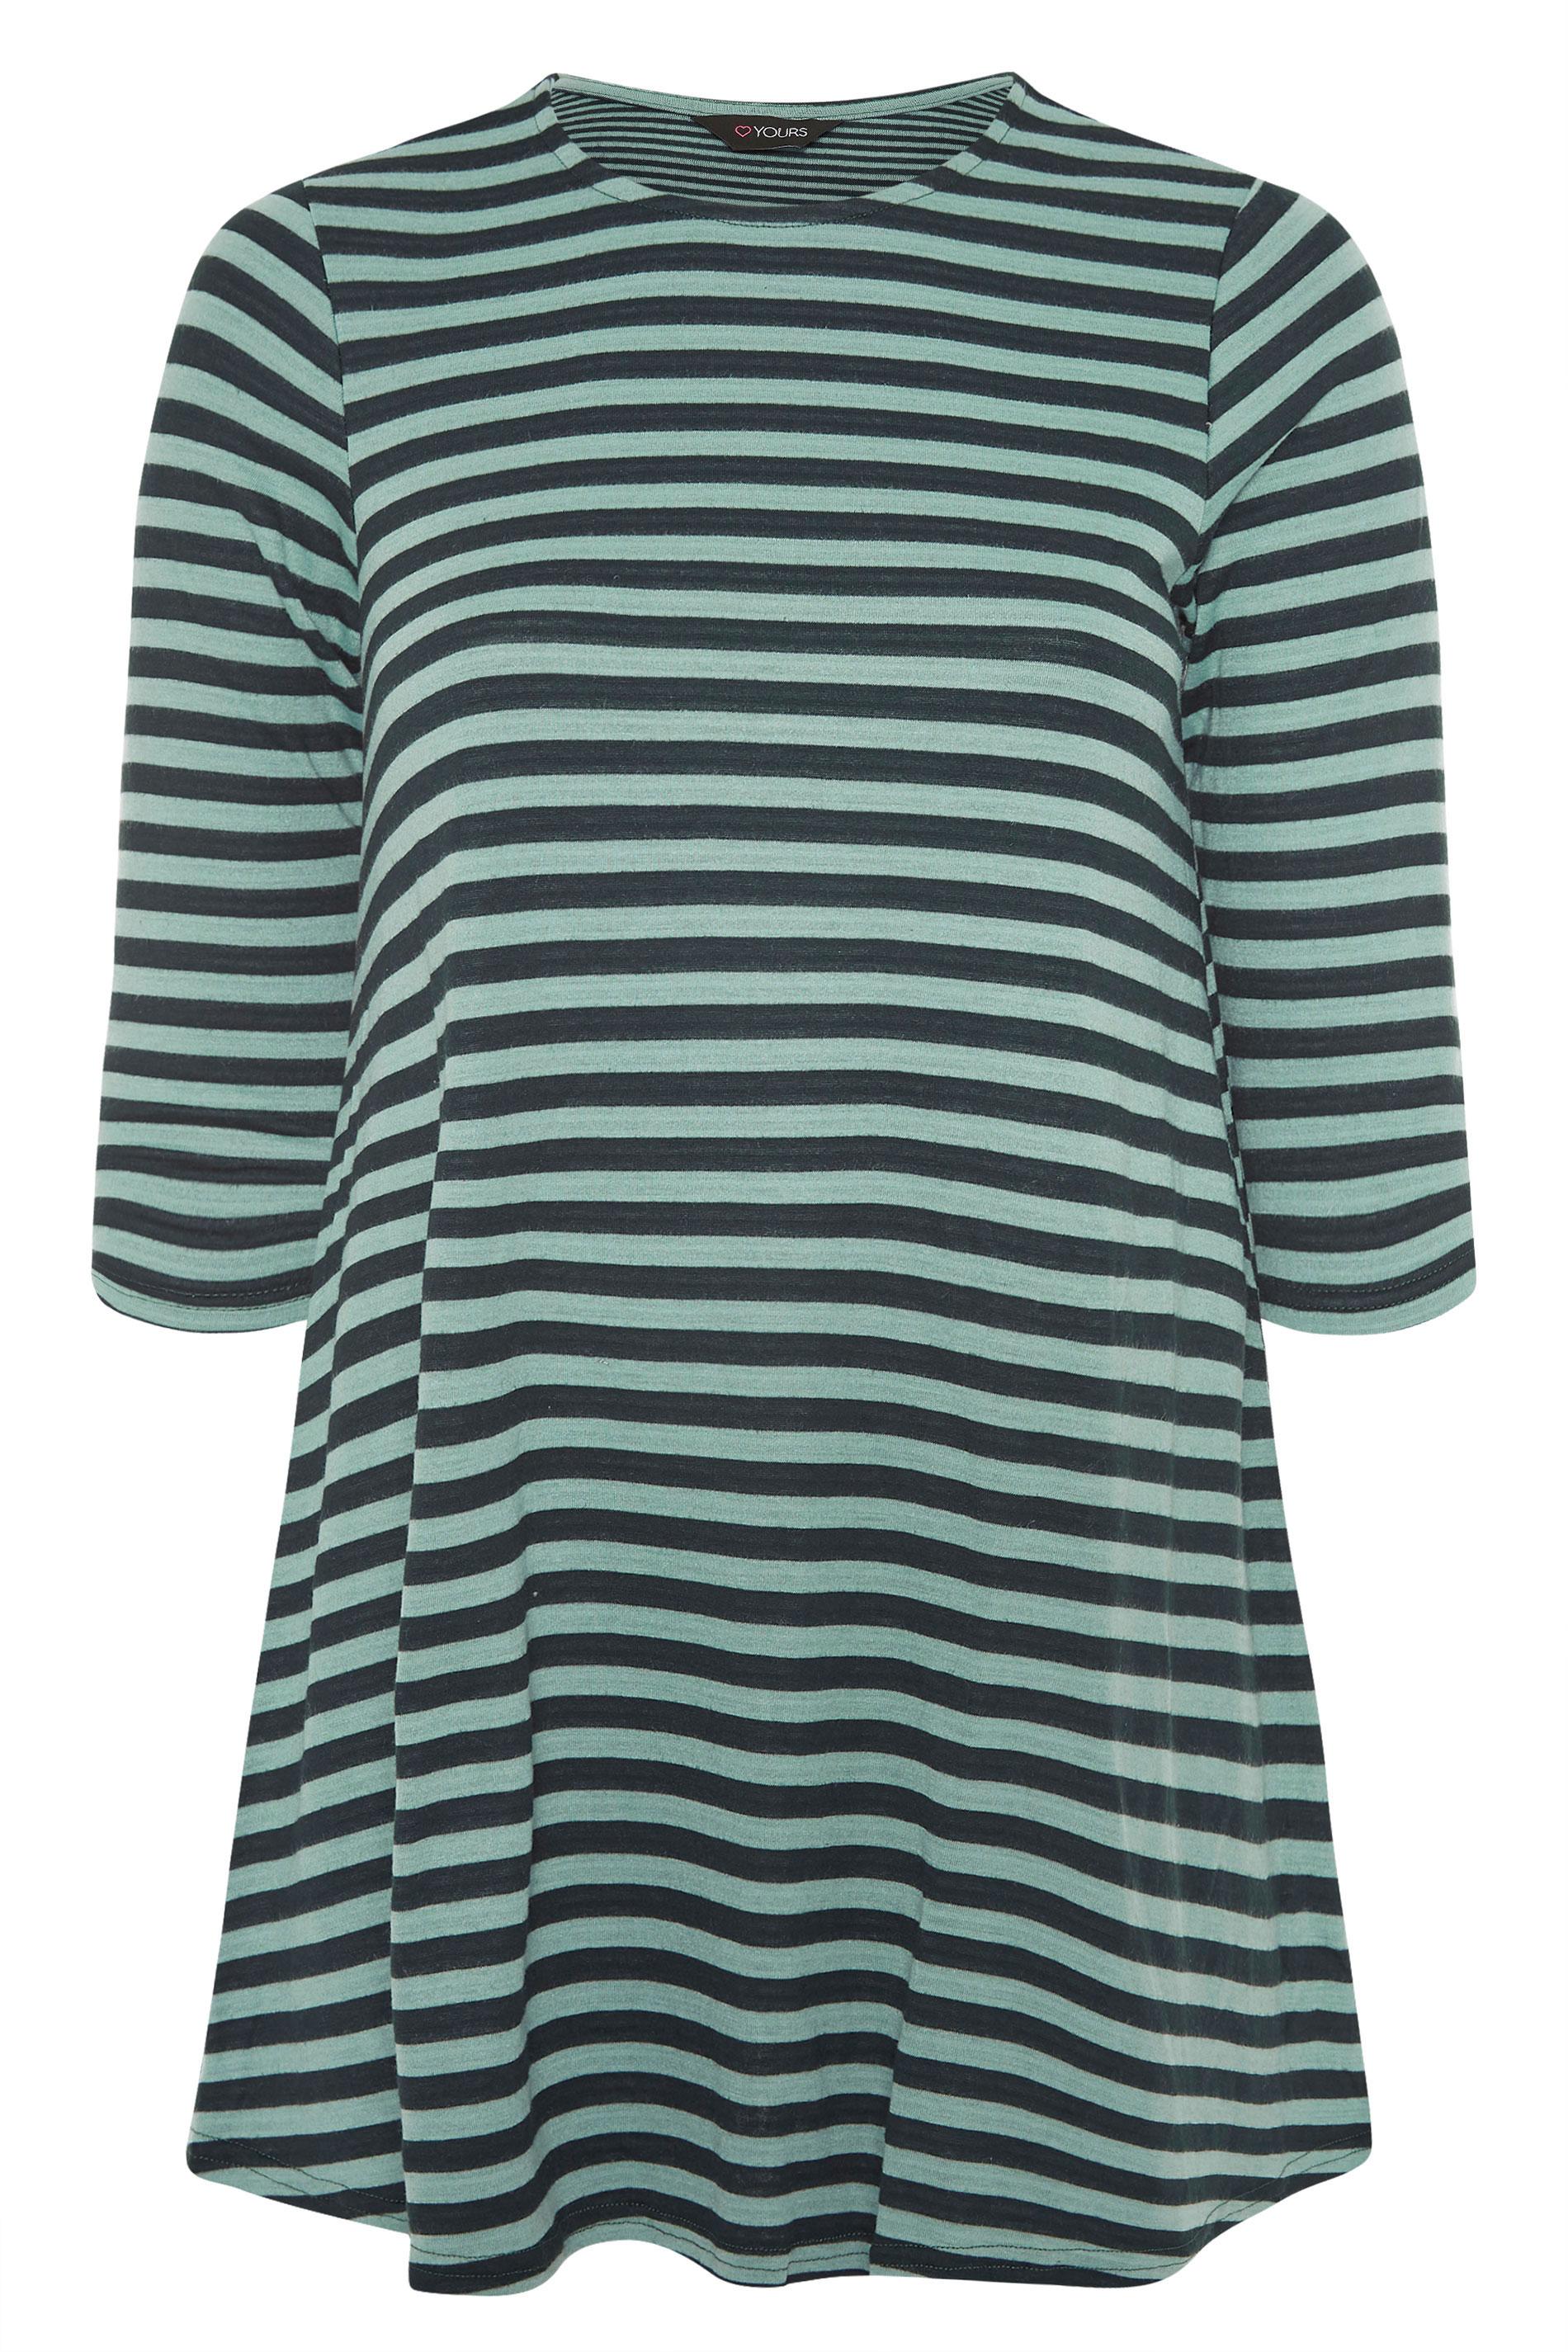 Green Stripe 3/4 Length Sleeve Top_F.jpg